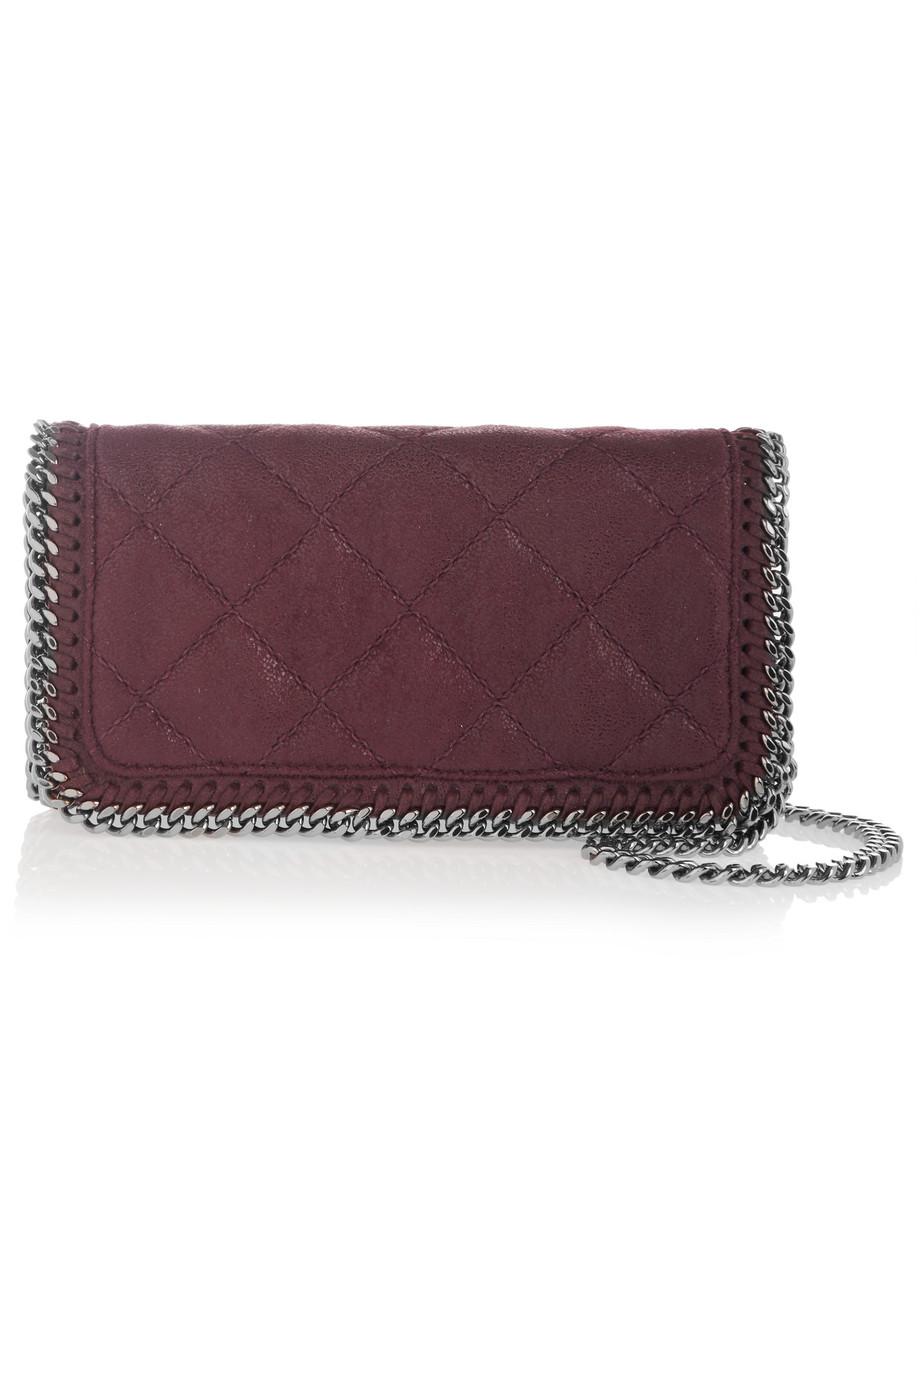 Stella Mccartney The Falabella Faux Brushed-Leather Shoulder Bag, Burgundy, Women's